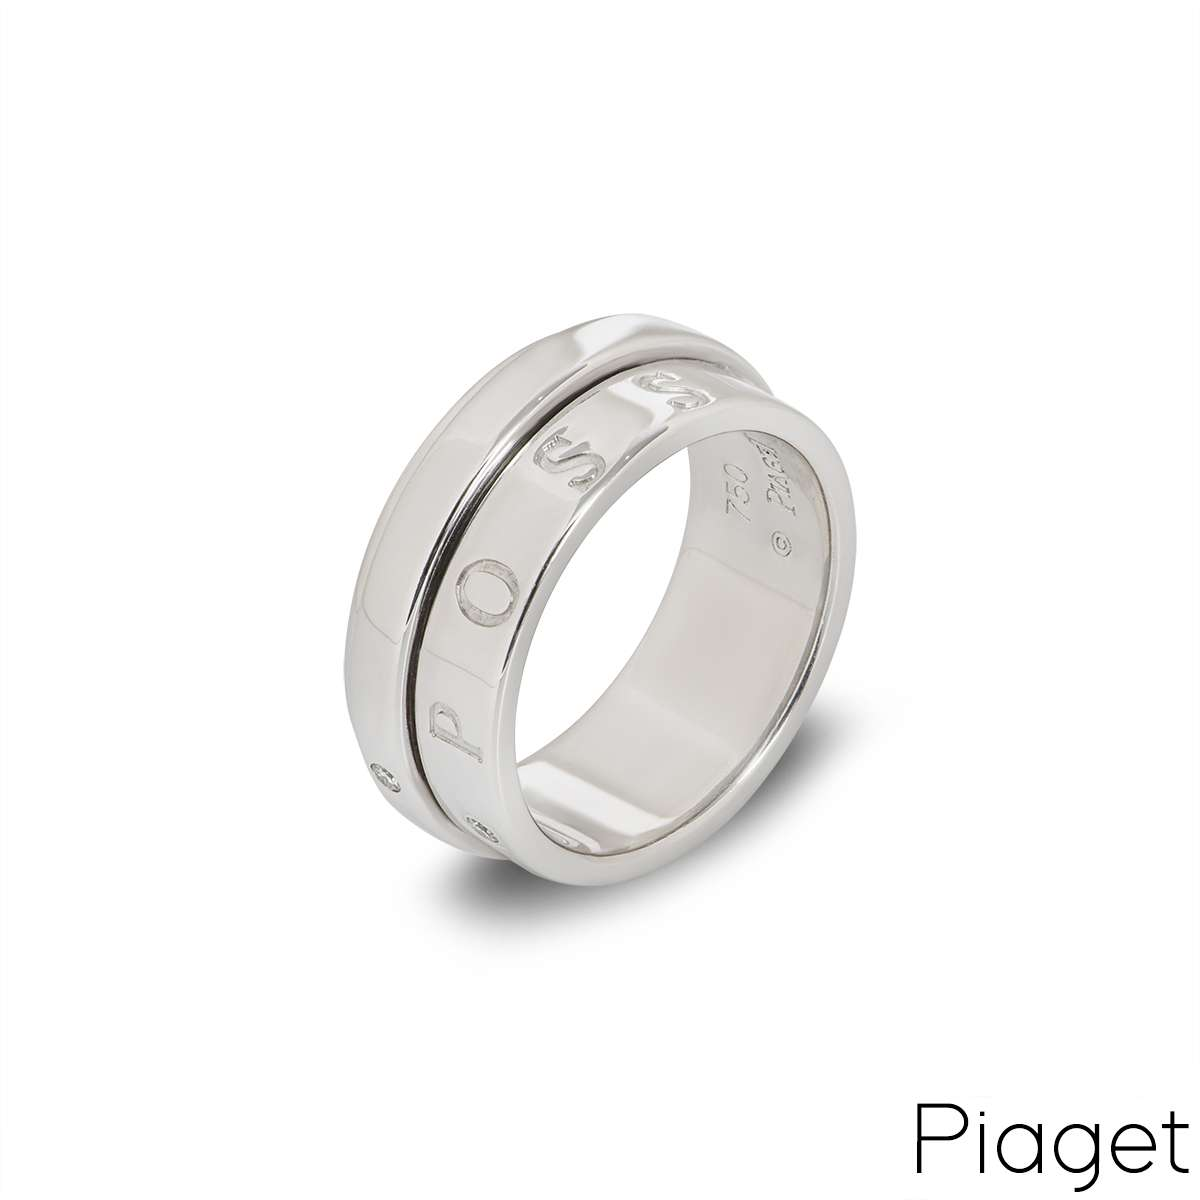 Piaget 18k White Gold Diamond Eccentric Possession Ring B&P G34PX253